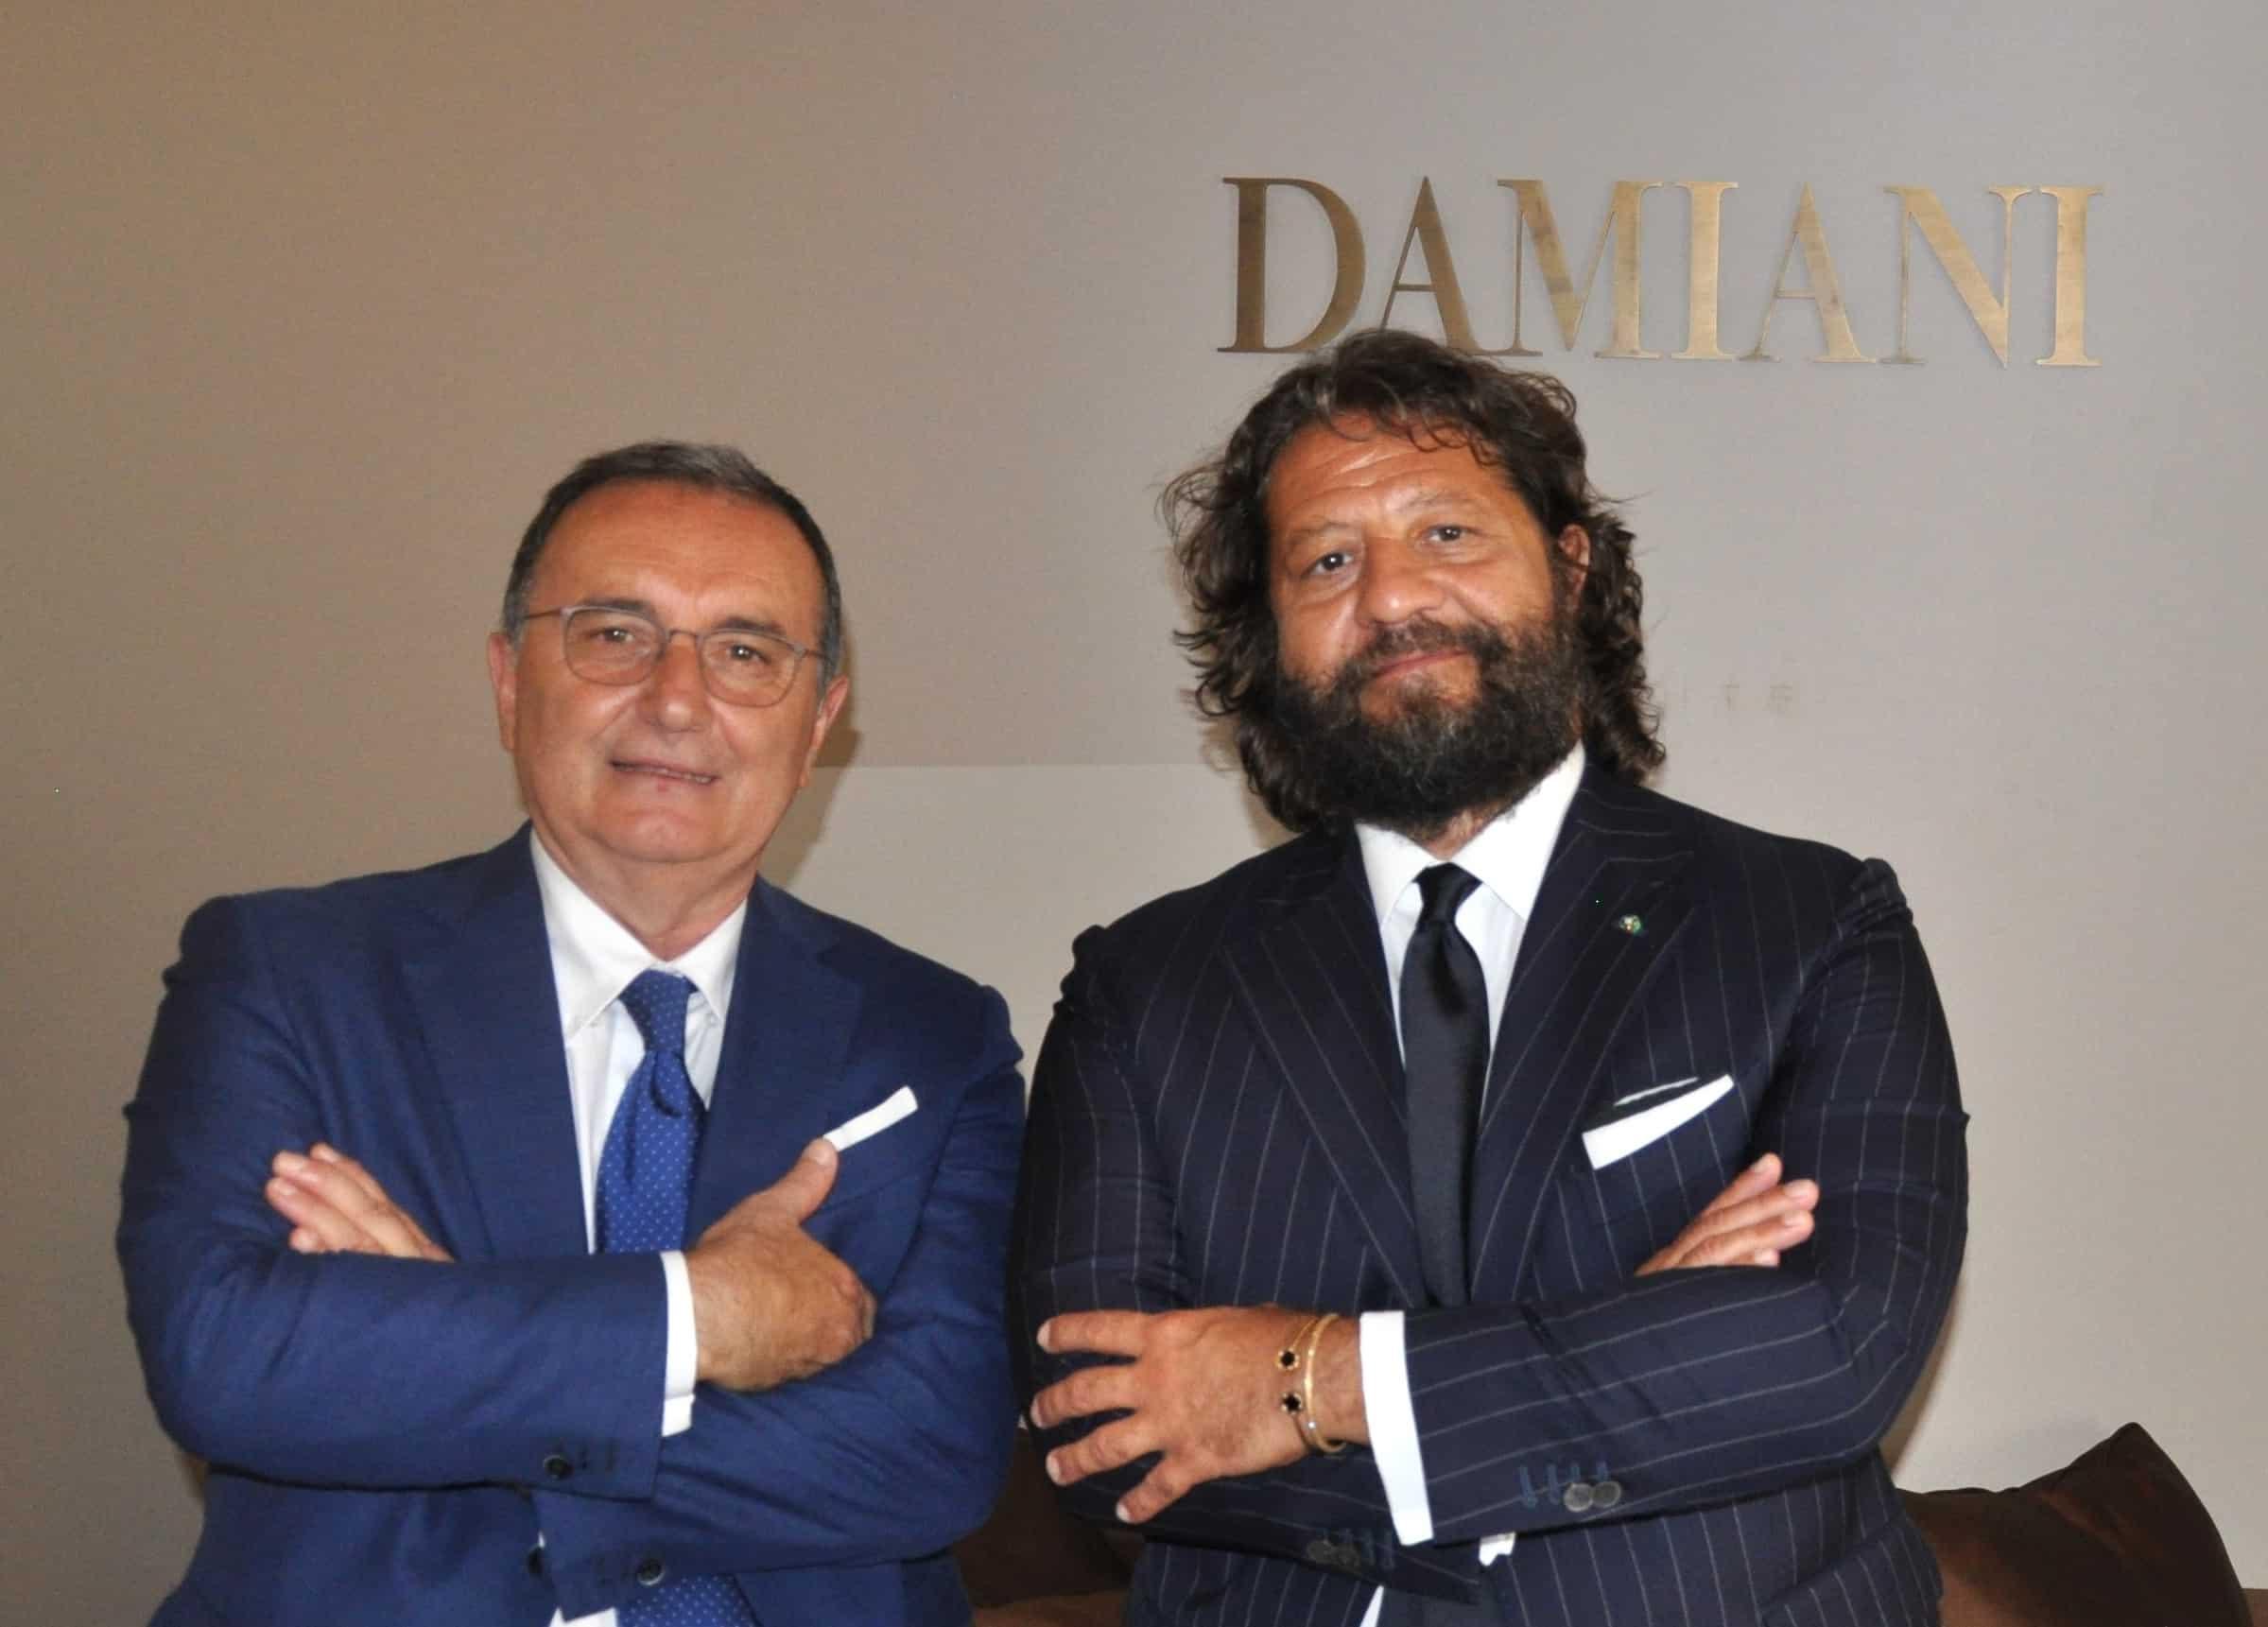 Paolo Cesari - Assogemme e Guido Grassi Damiani - Damiani__ Group